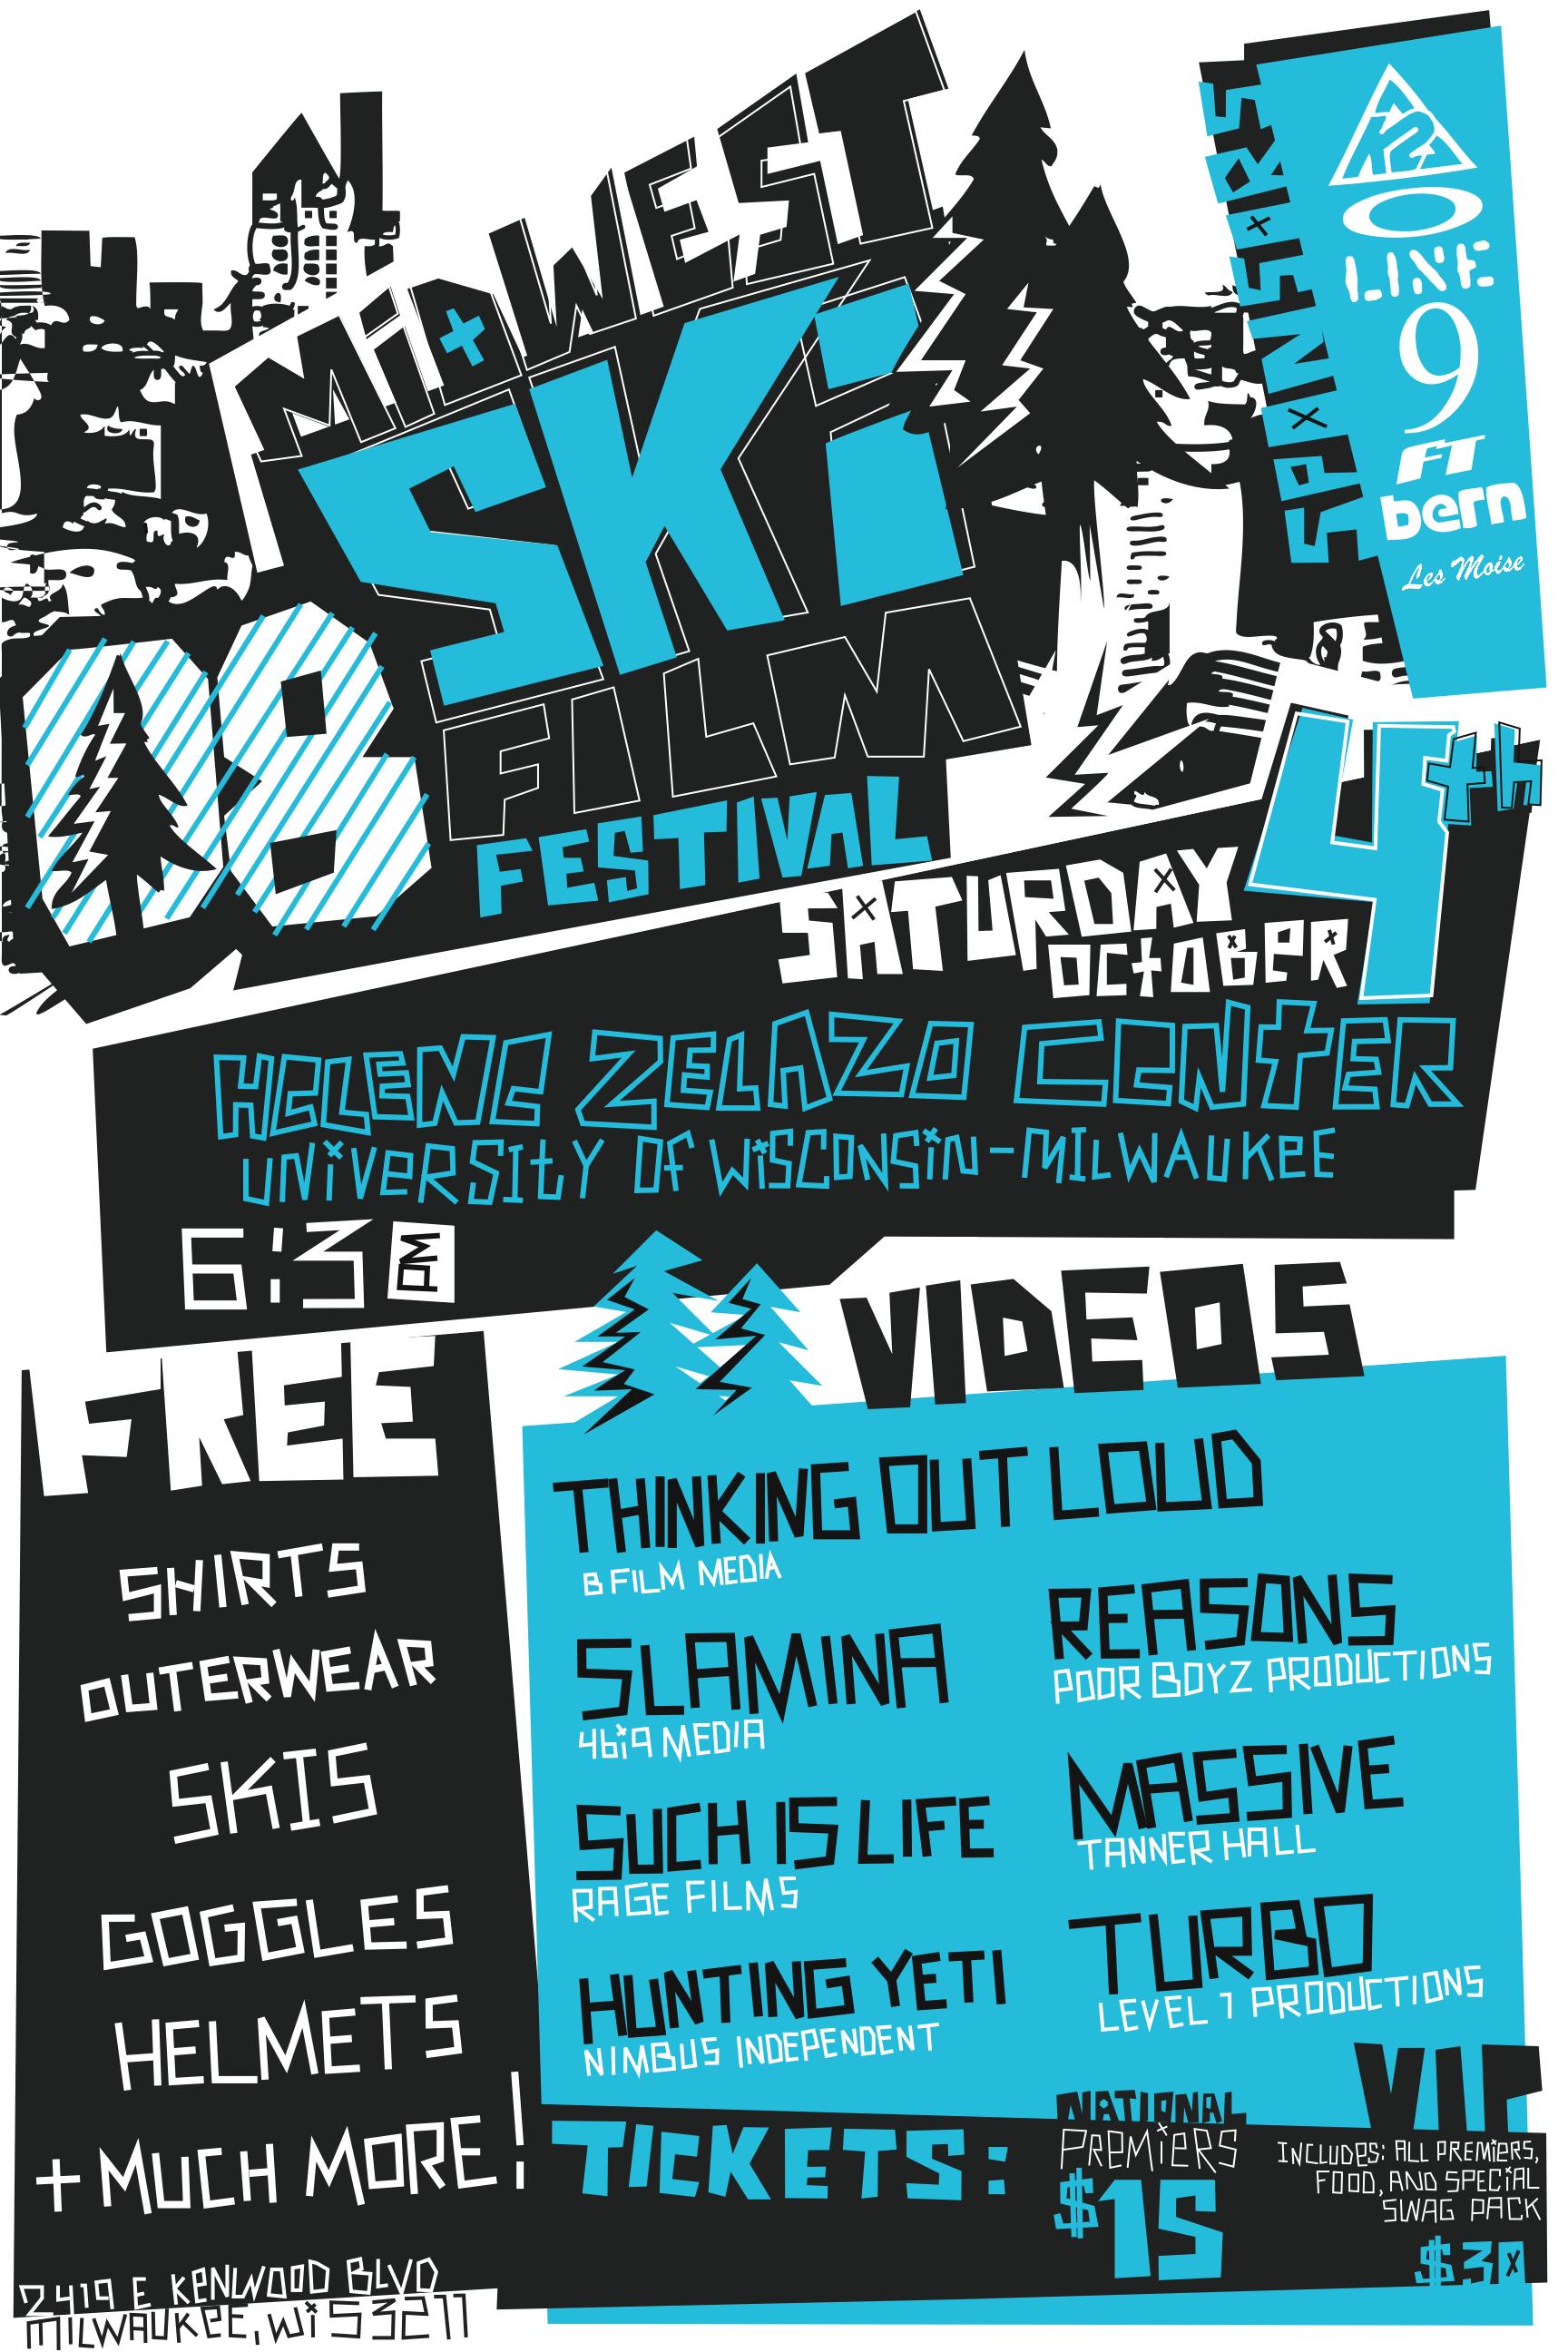 Midwest Ski Film Festival - Wikipedia